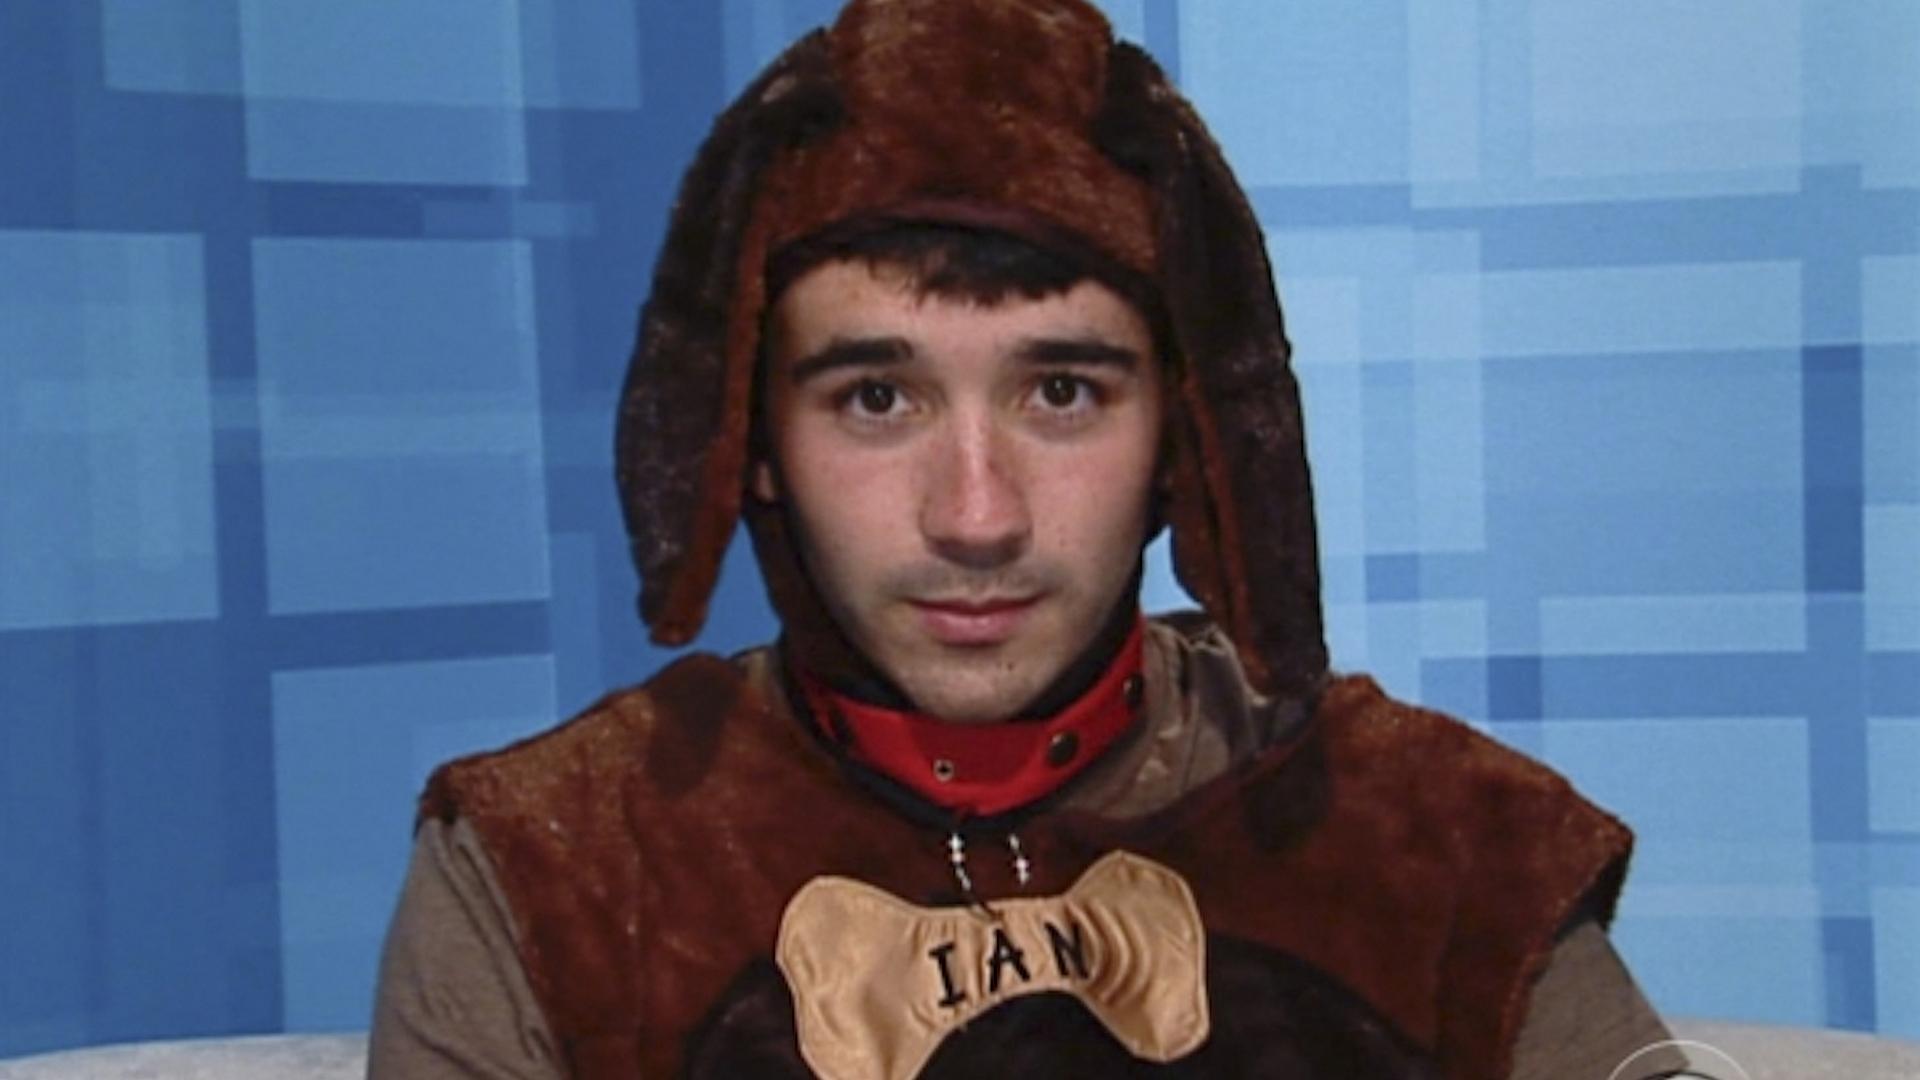 Ian Terry's dog costume